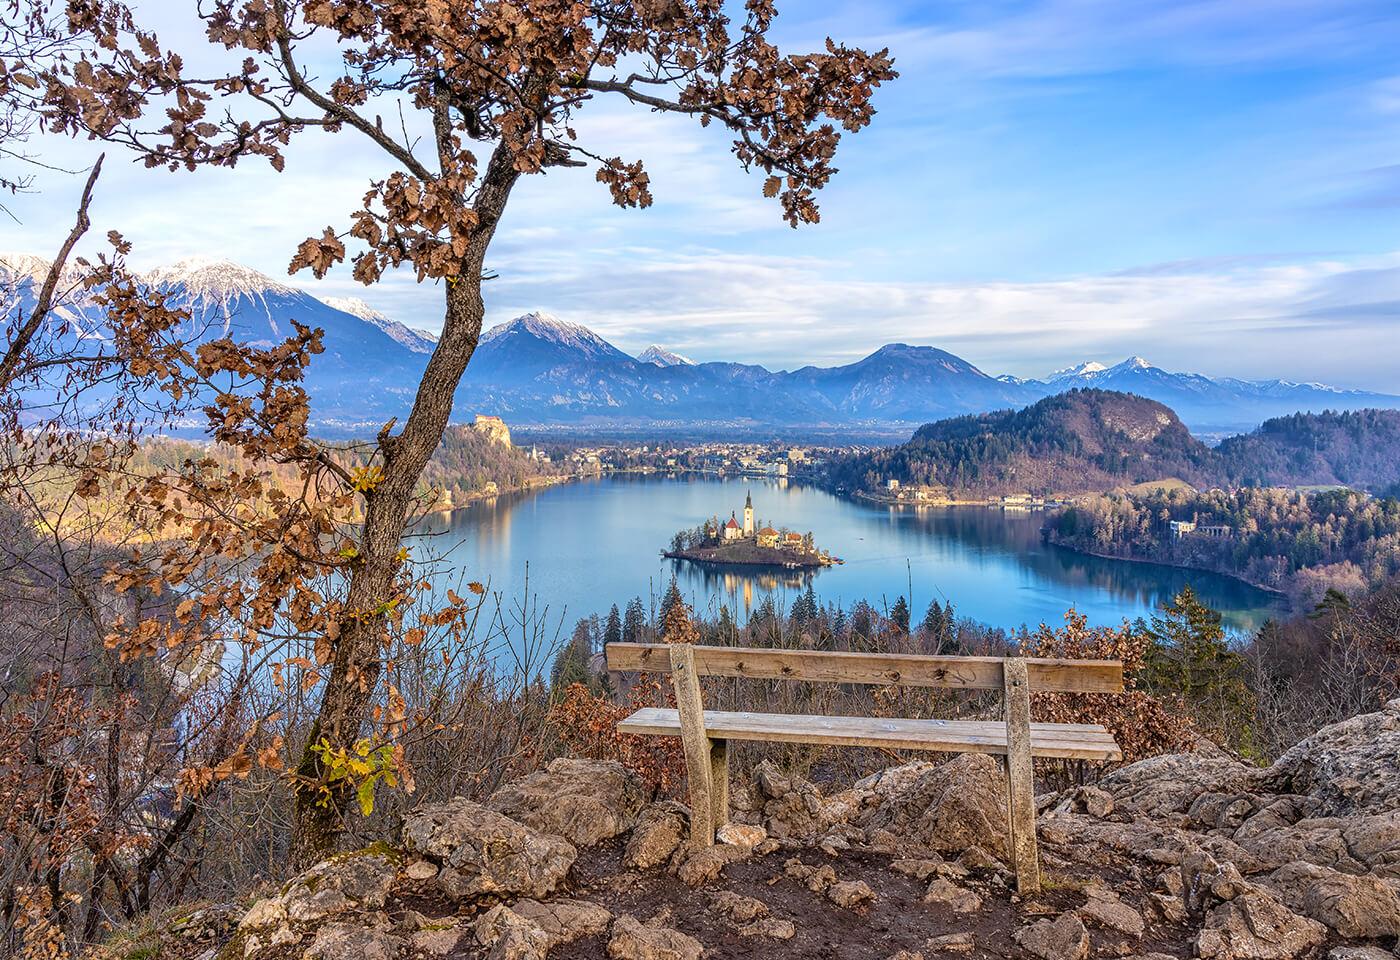 Landscape image by Greg Sullavan